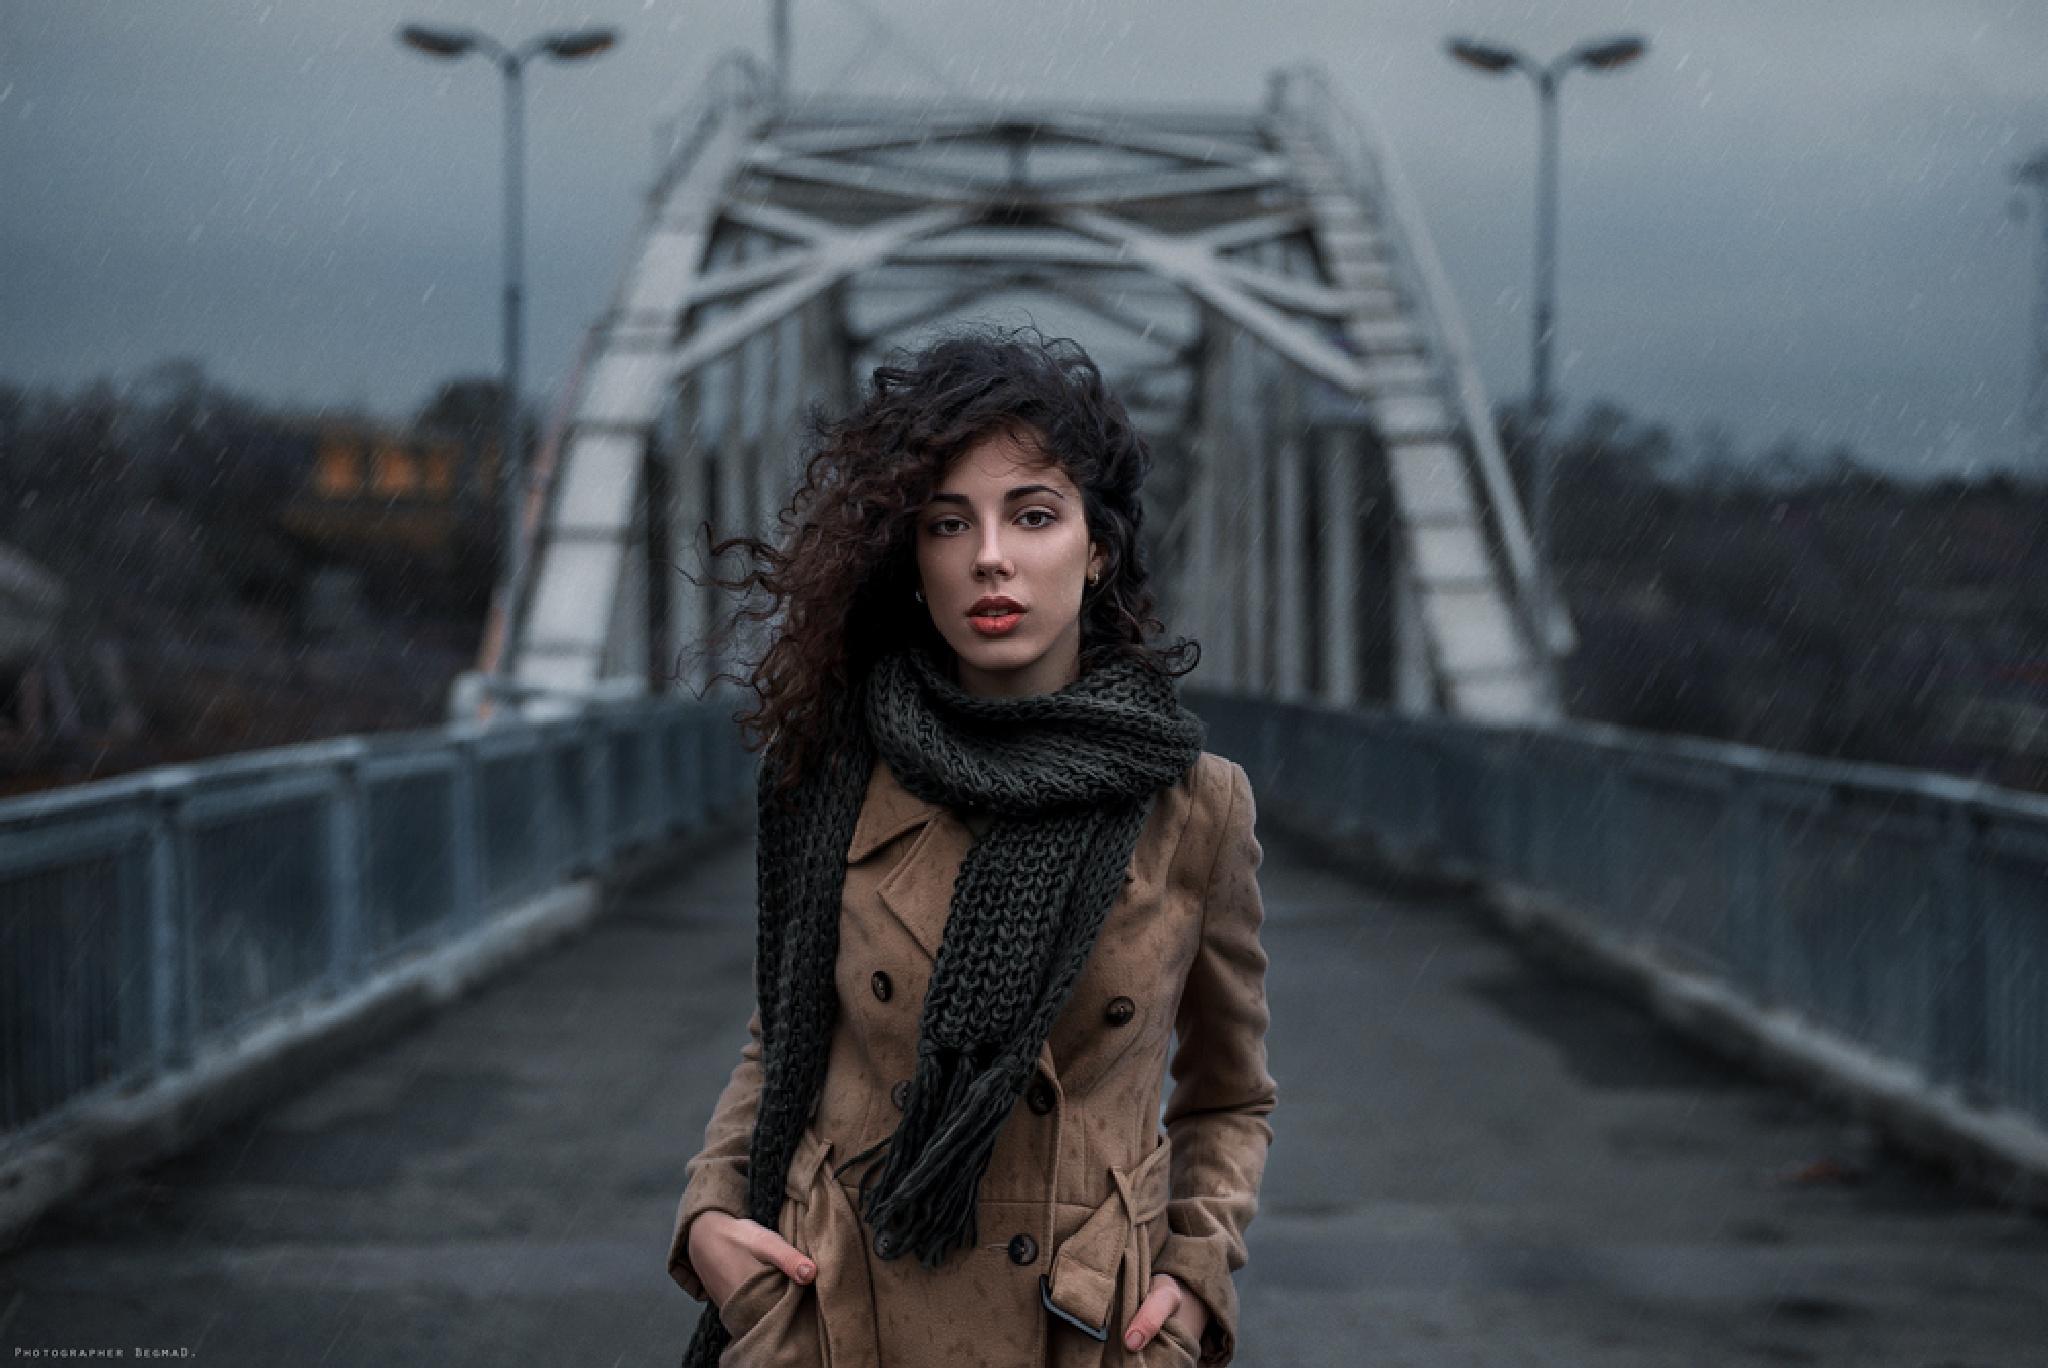 Yuliya by Dima Begma (Дмитрий Бегма)